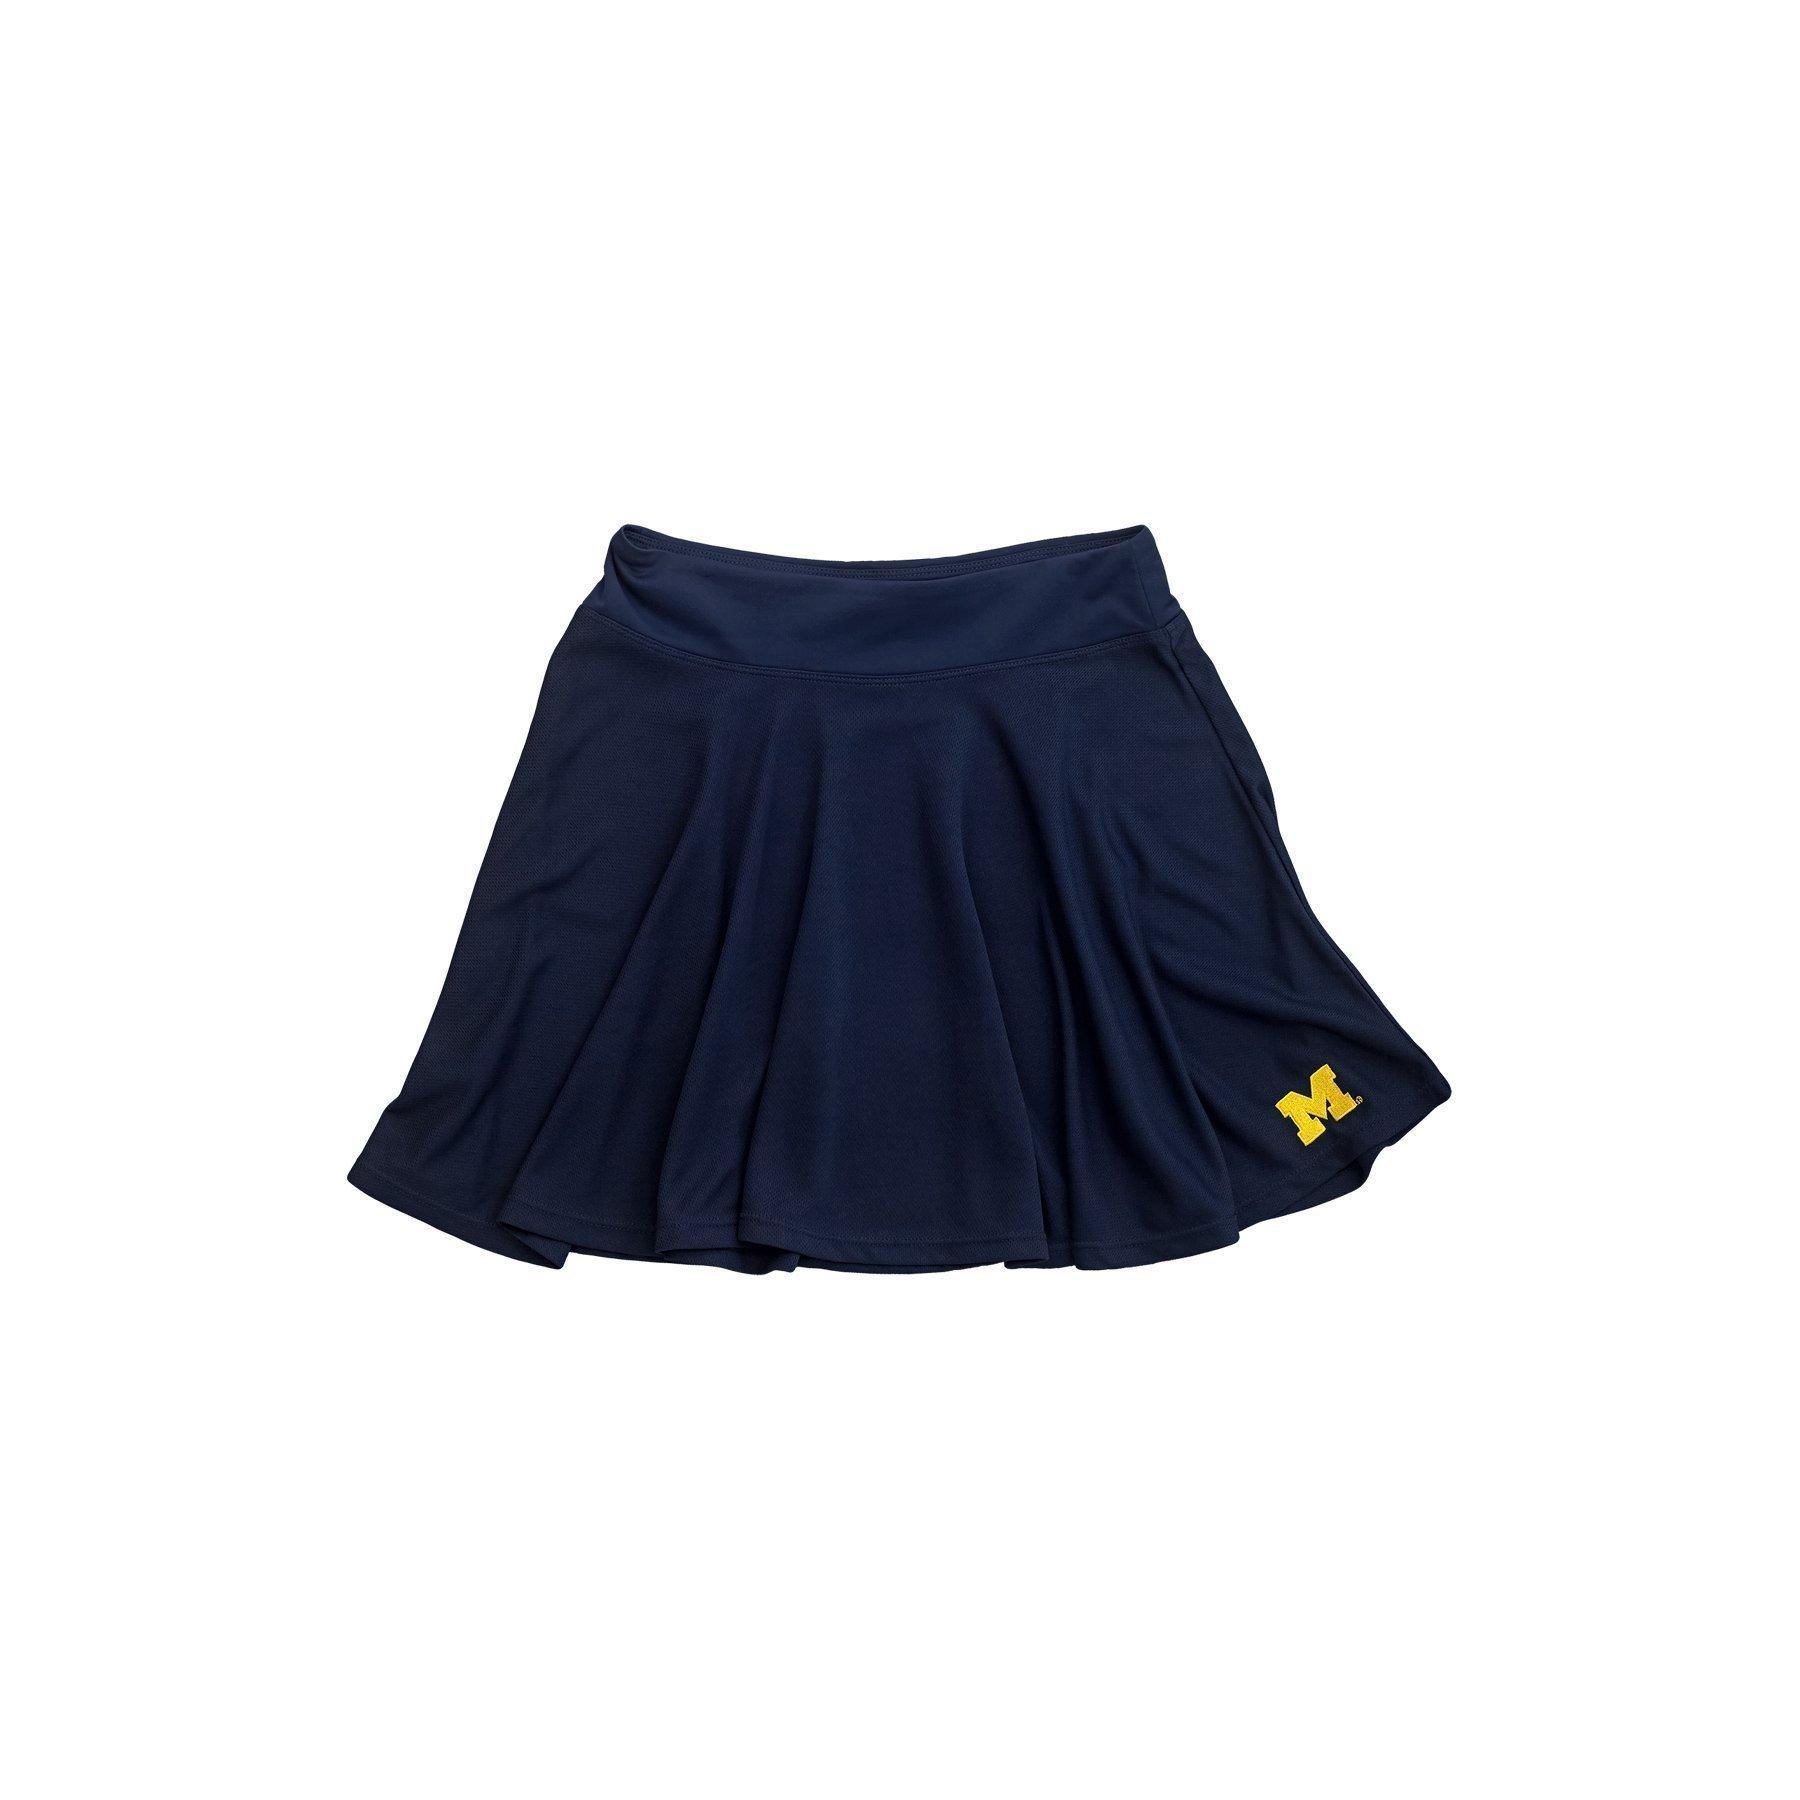 nuyu University of Michigan Skater Skirt Size S